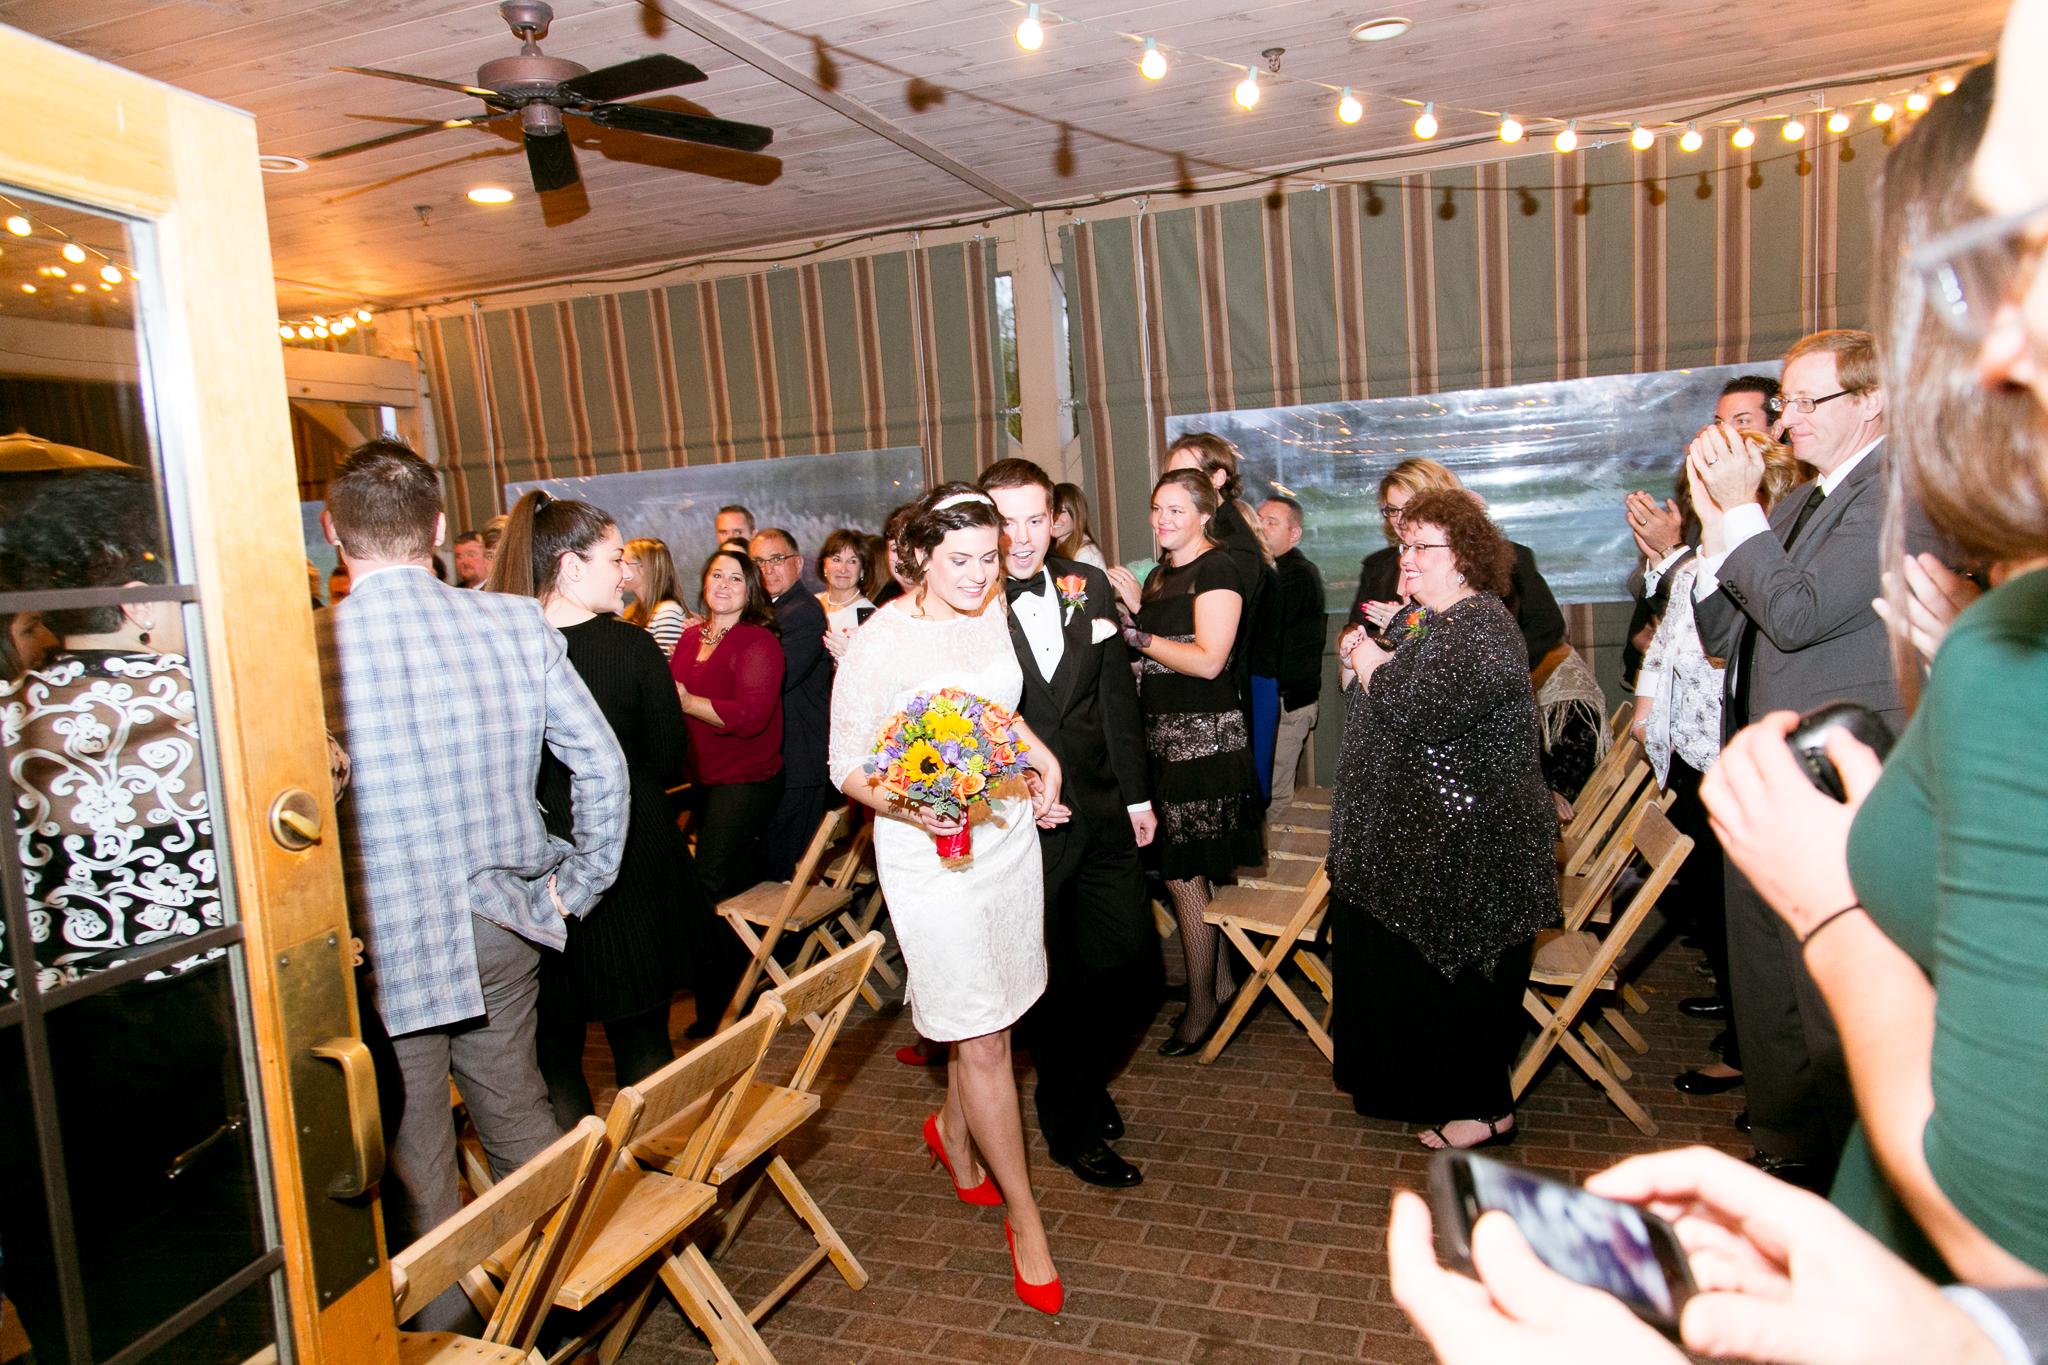 camuglia-whomstudio-chelsea_and_andy-nycphotographer-wedding-brooklyn-buffalo-timberlodge-093-5525.jpg